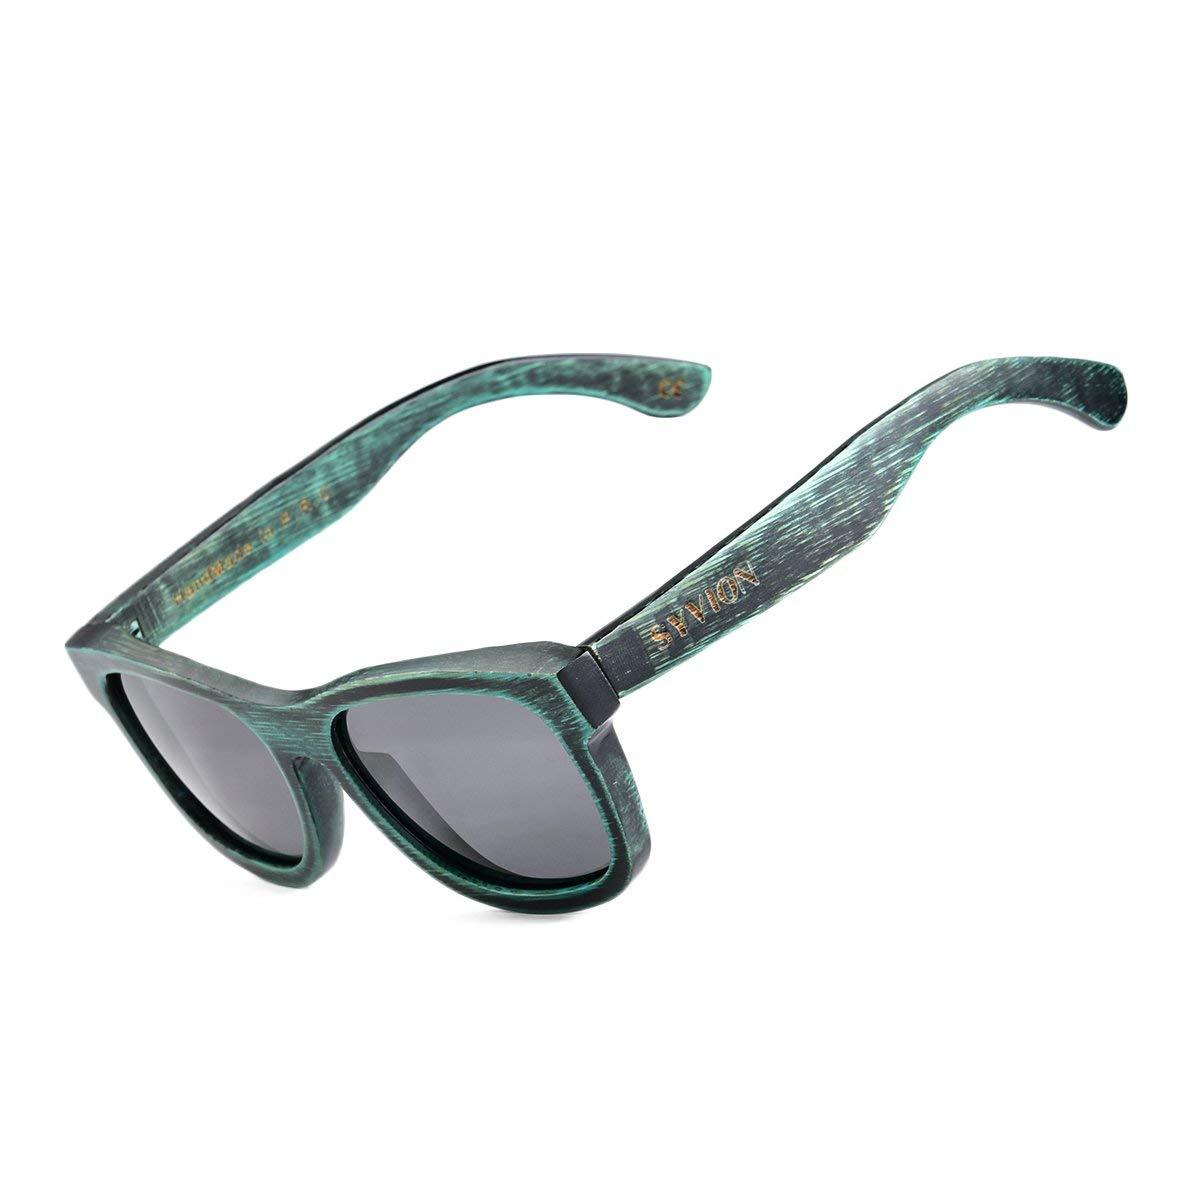 146da3835526 Get Quotations · SYVION Polarized Wood Sunglasses For Mens Womens Handmade  Vintage Bamboo Frame